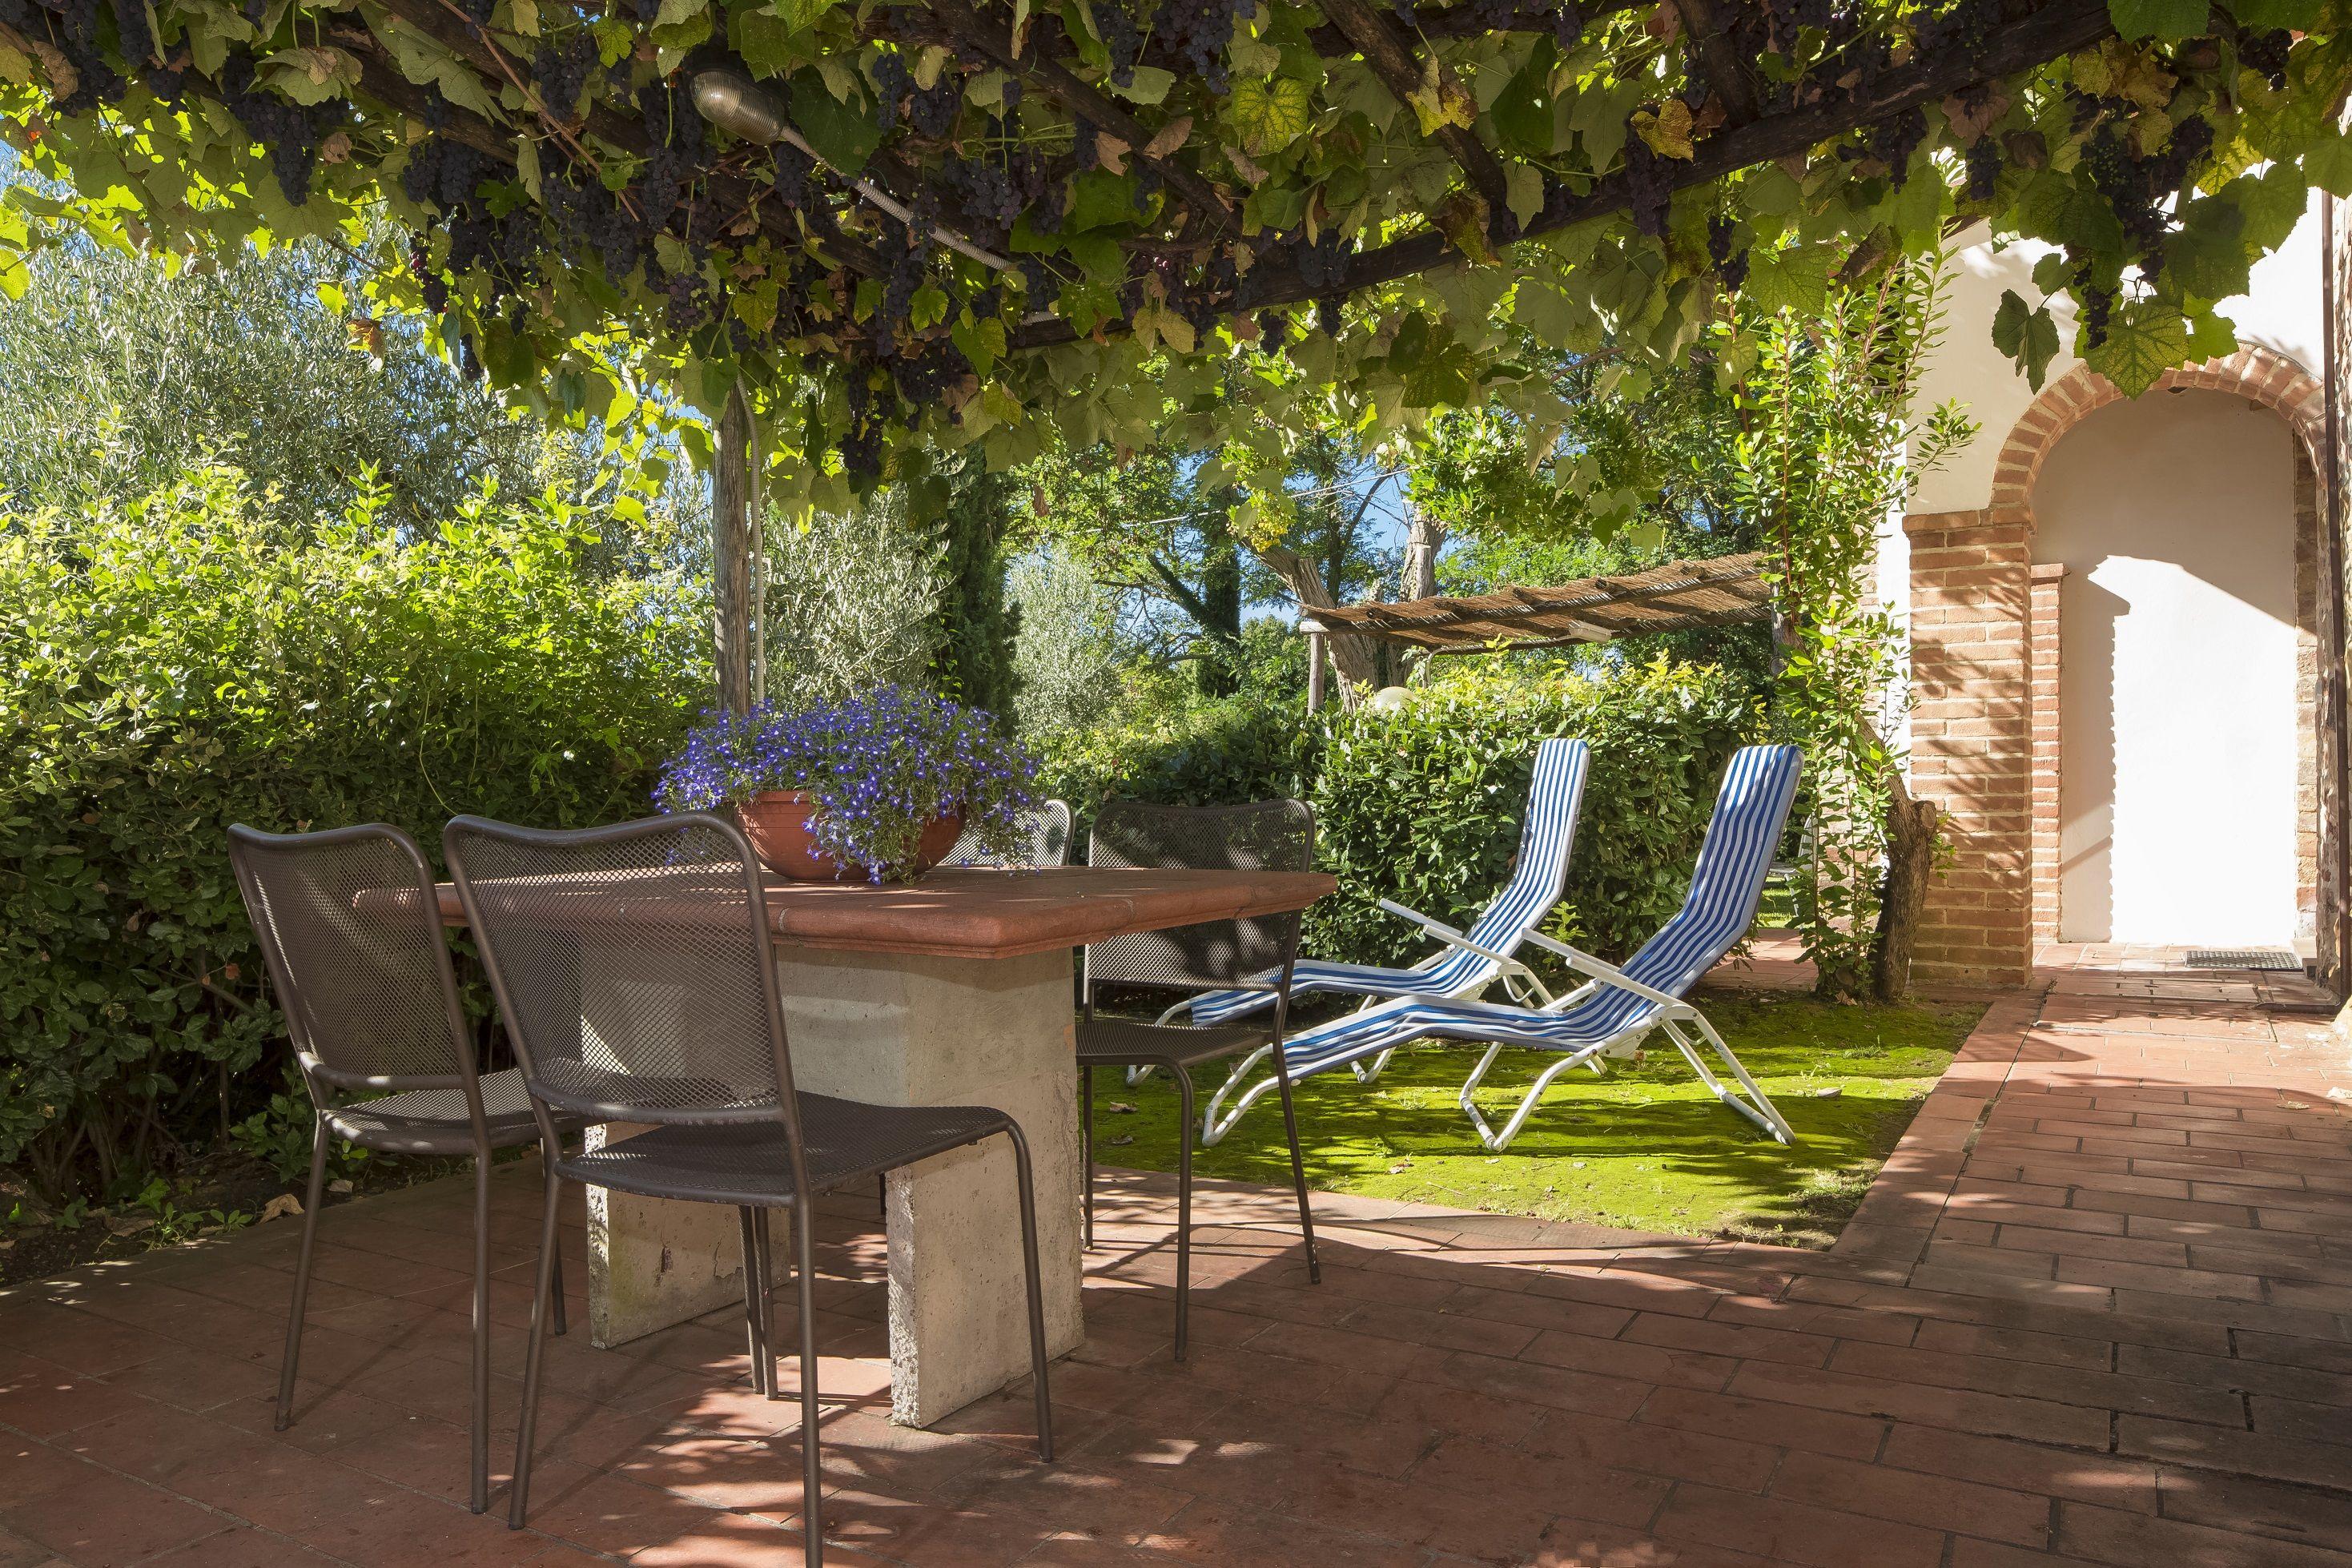 Apartment Agriturismo Il Sapito - Cherubini Holiday Home photo 16874836